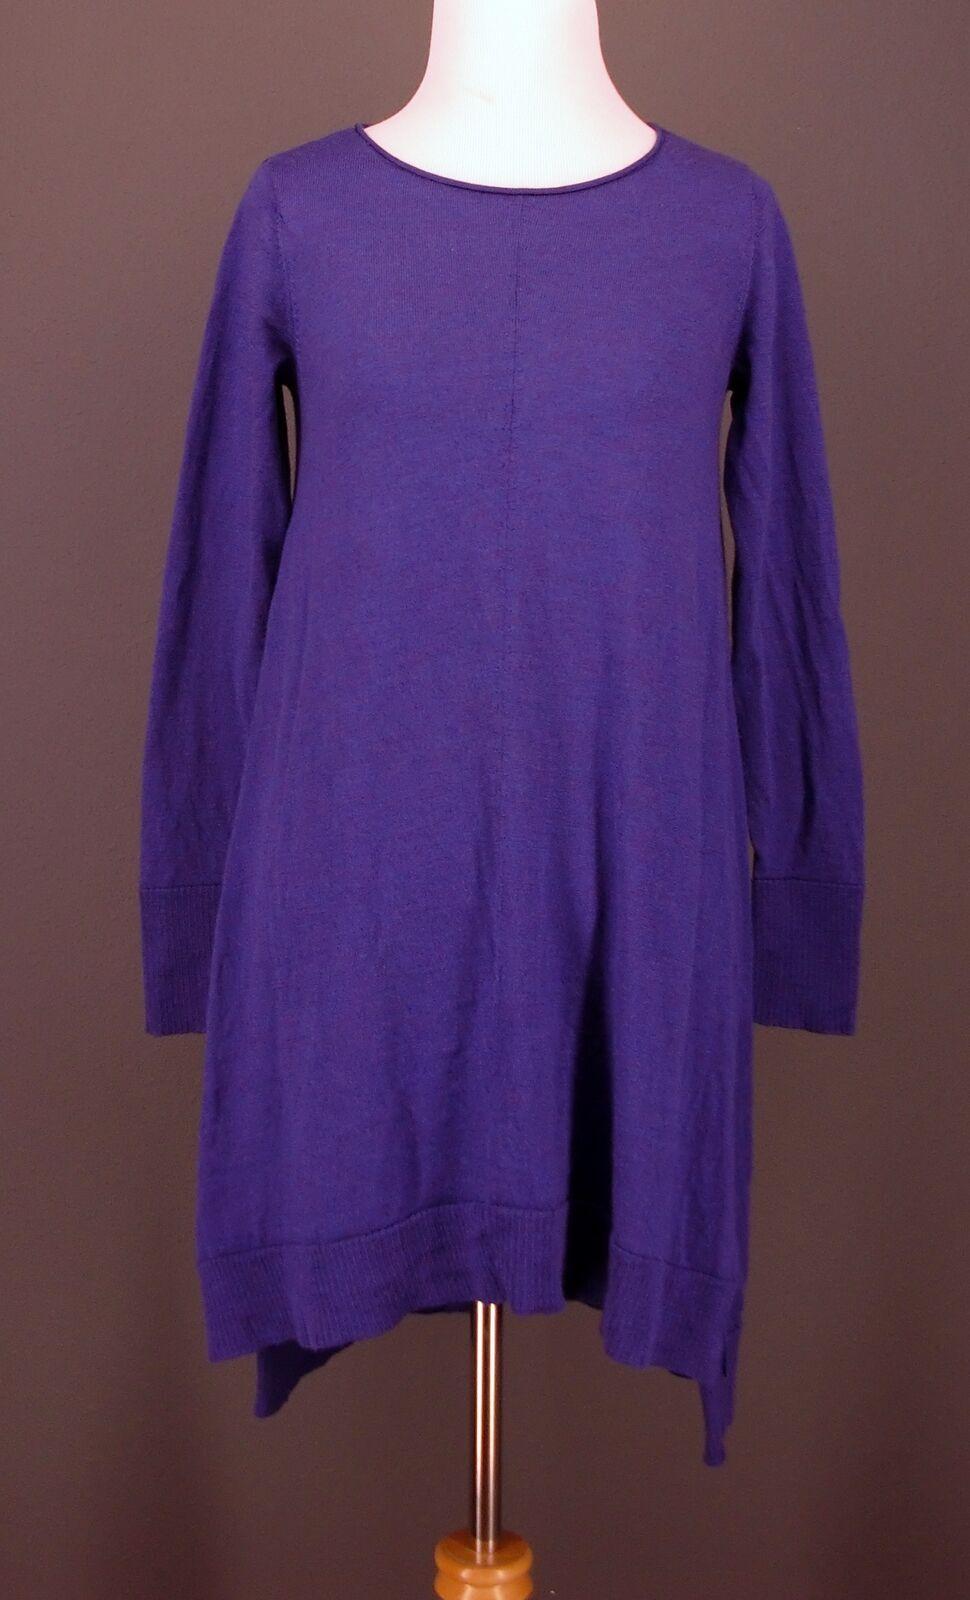 EILEEN FISHER Sweater Sweater Sweater XS Purple F3MF-4 Sharkbite Tunic 100% Merino Wool 125cc9